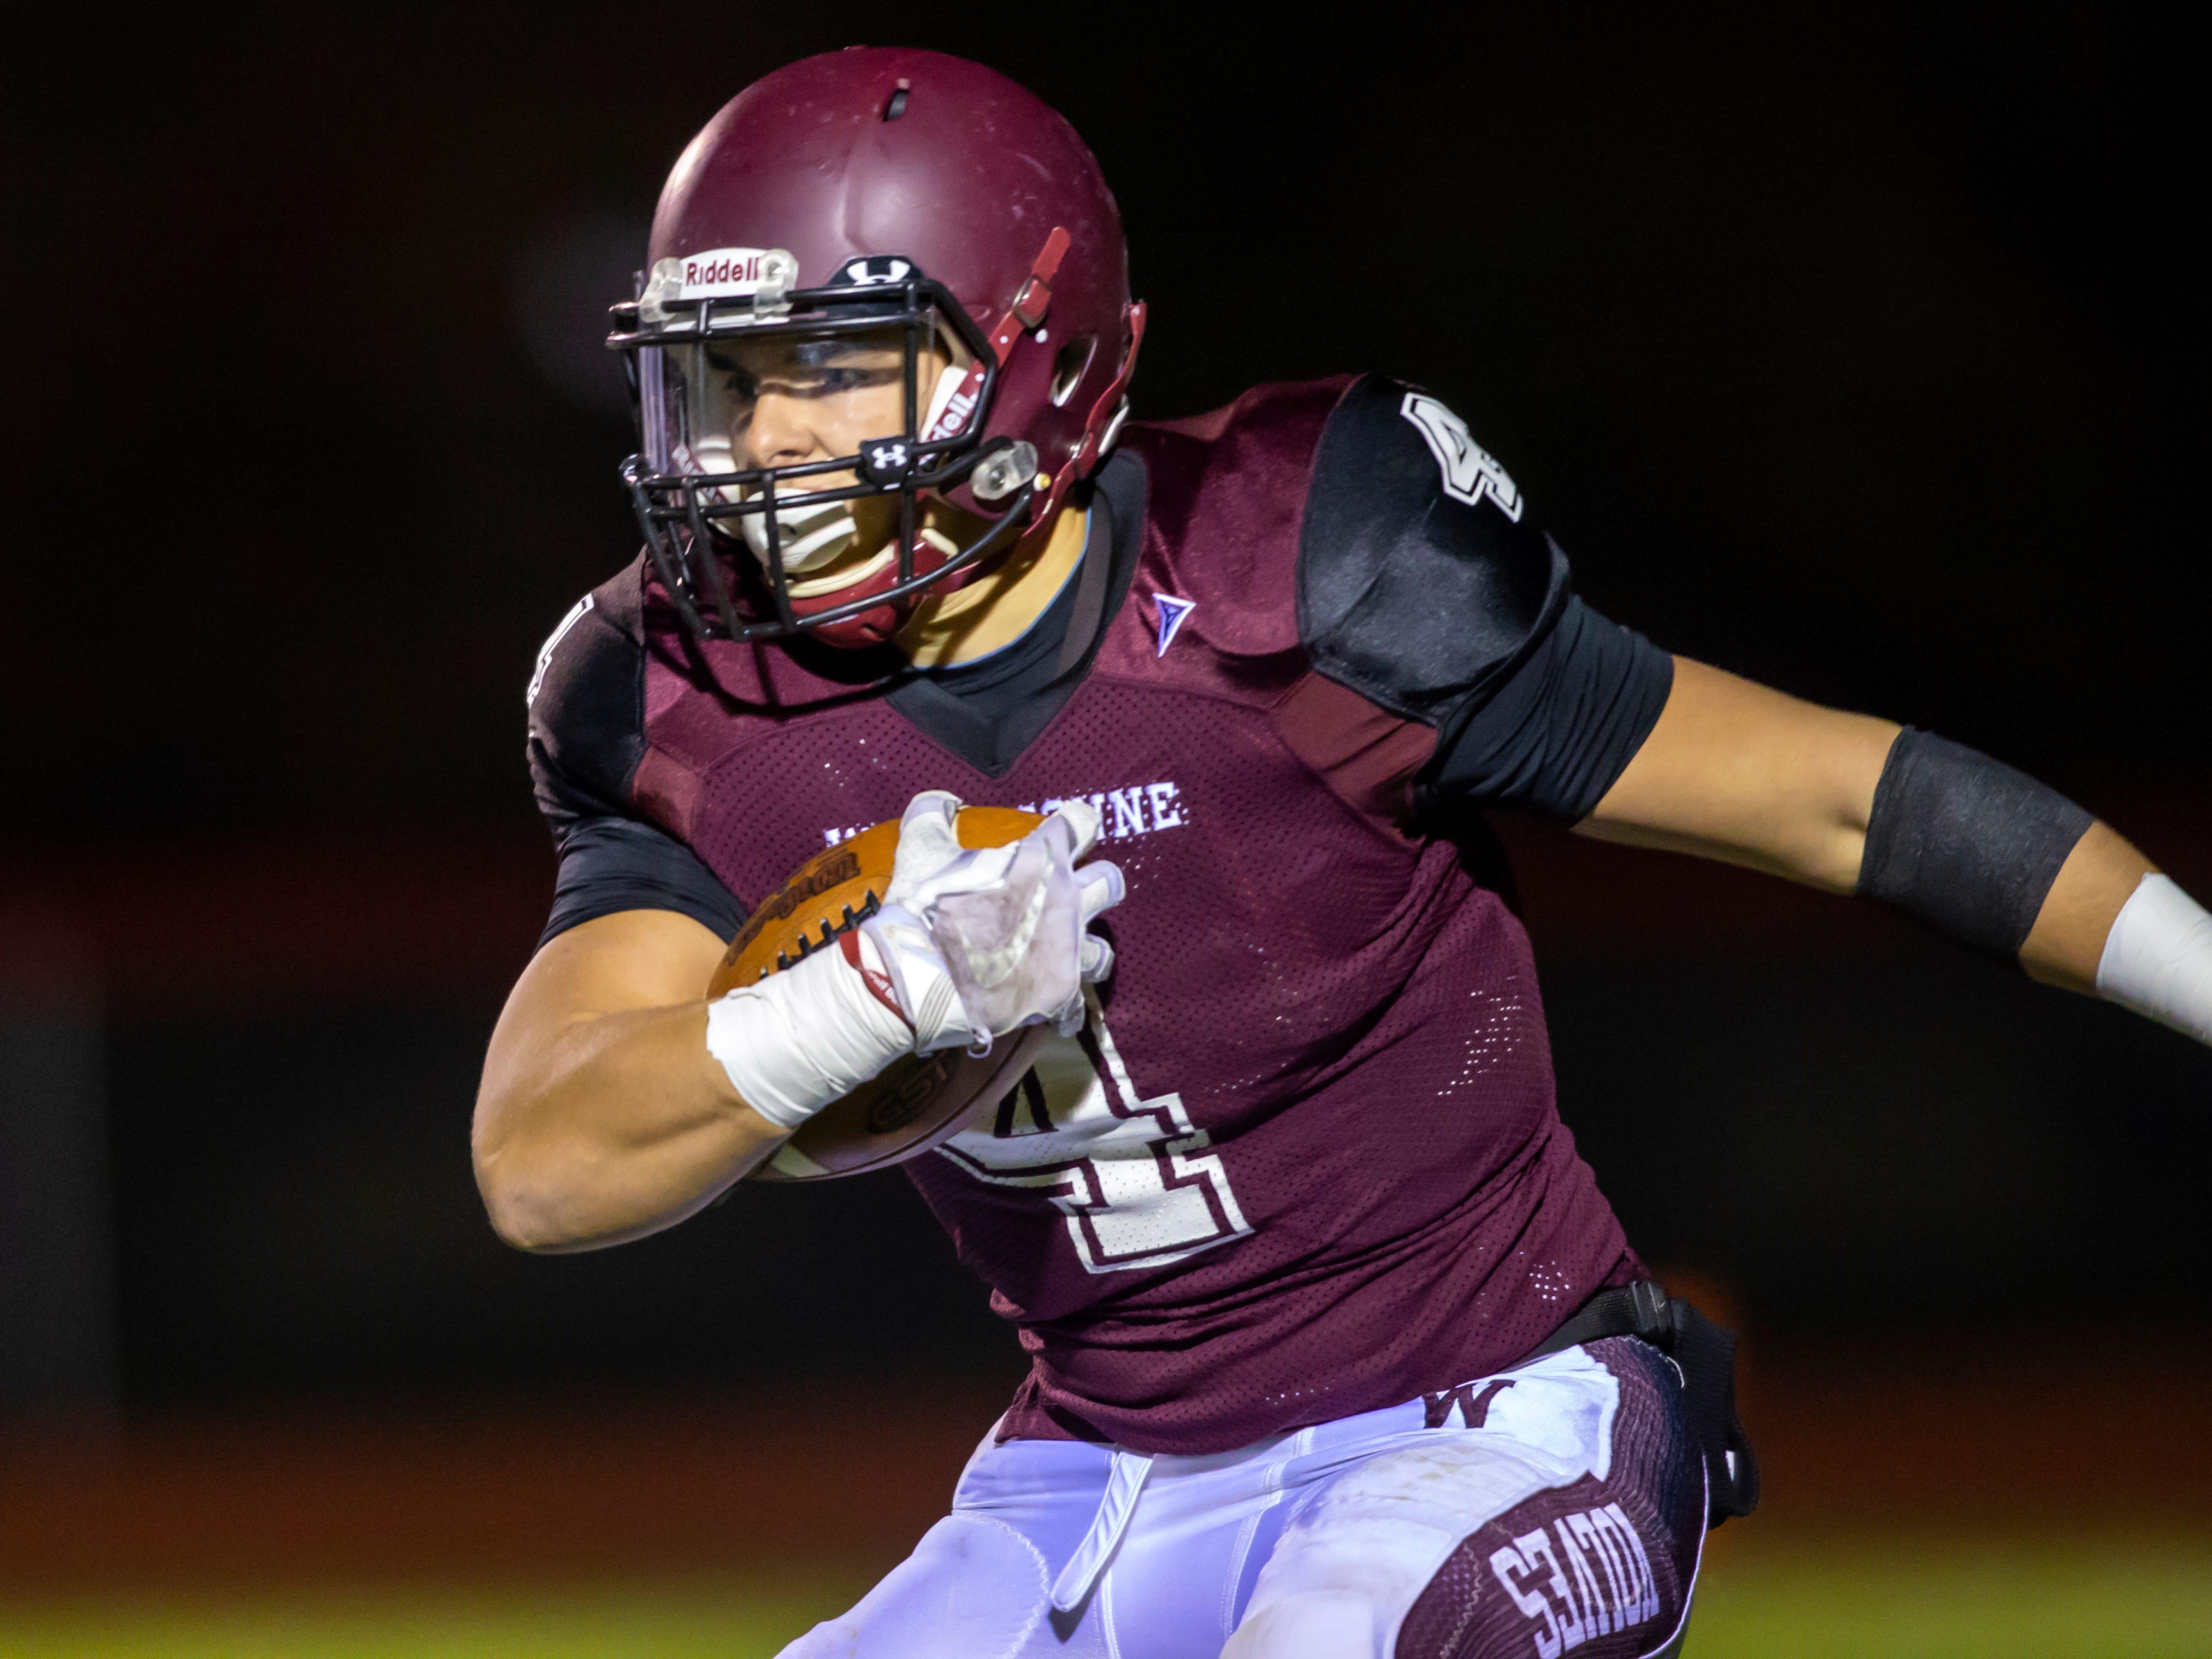 Winneconne's Austin Hecker runs the ball at Winneconne High School on Friday, October 26, 2018.